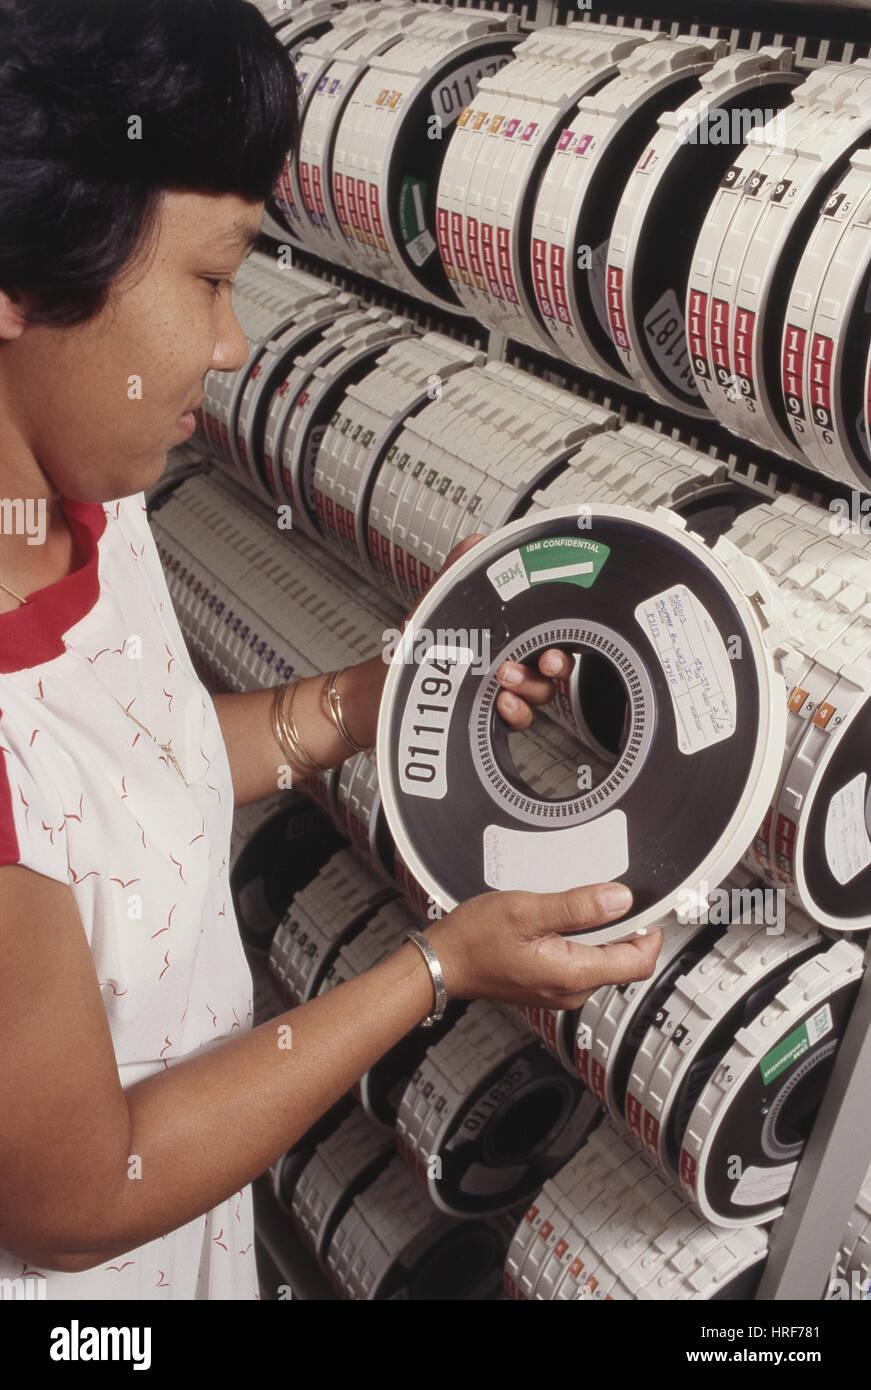 IBM Employee and Computer Storage Tape, c. 1980s - Stock Image